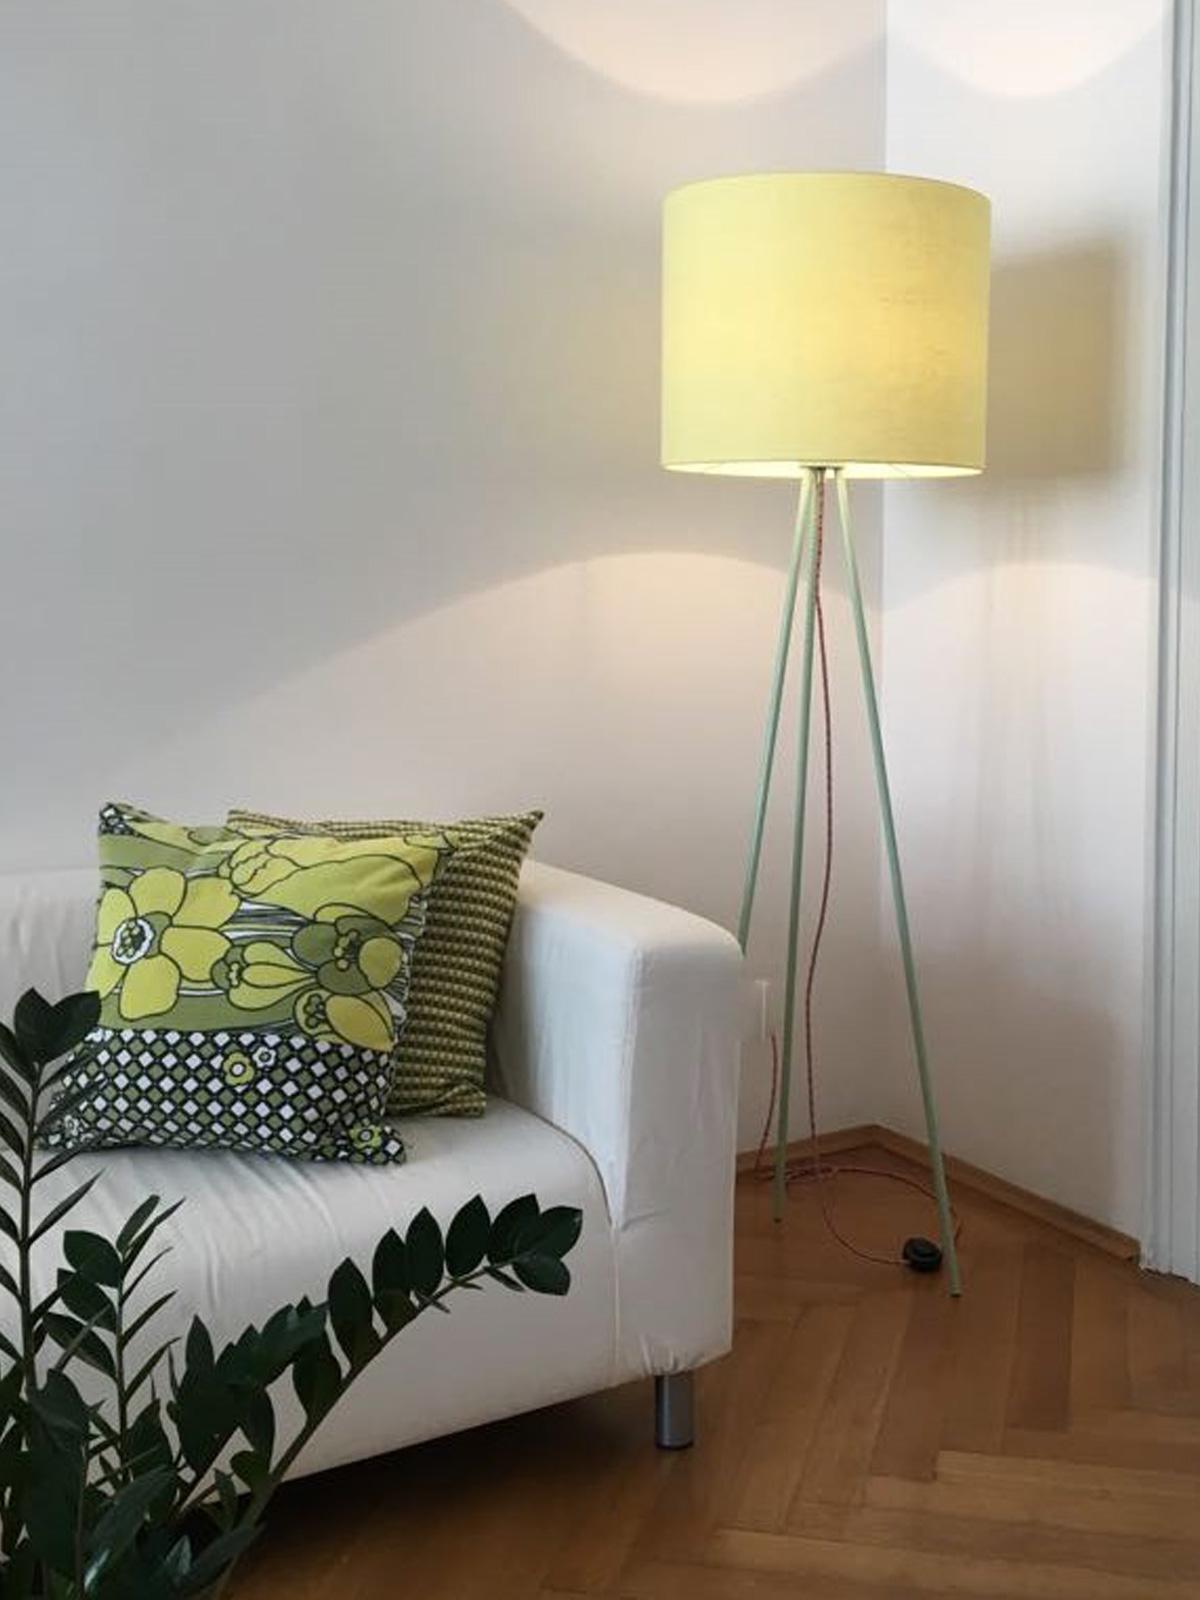 Hygge Linum Tripod Stehleuchte Lumbono DesignOrt Onlineshop Lampen Berlin